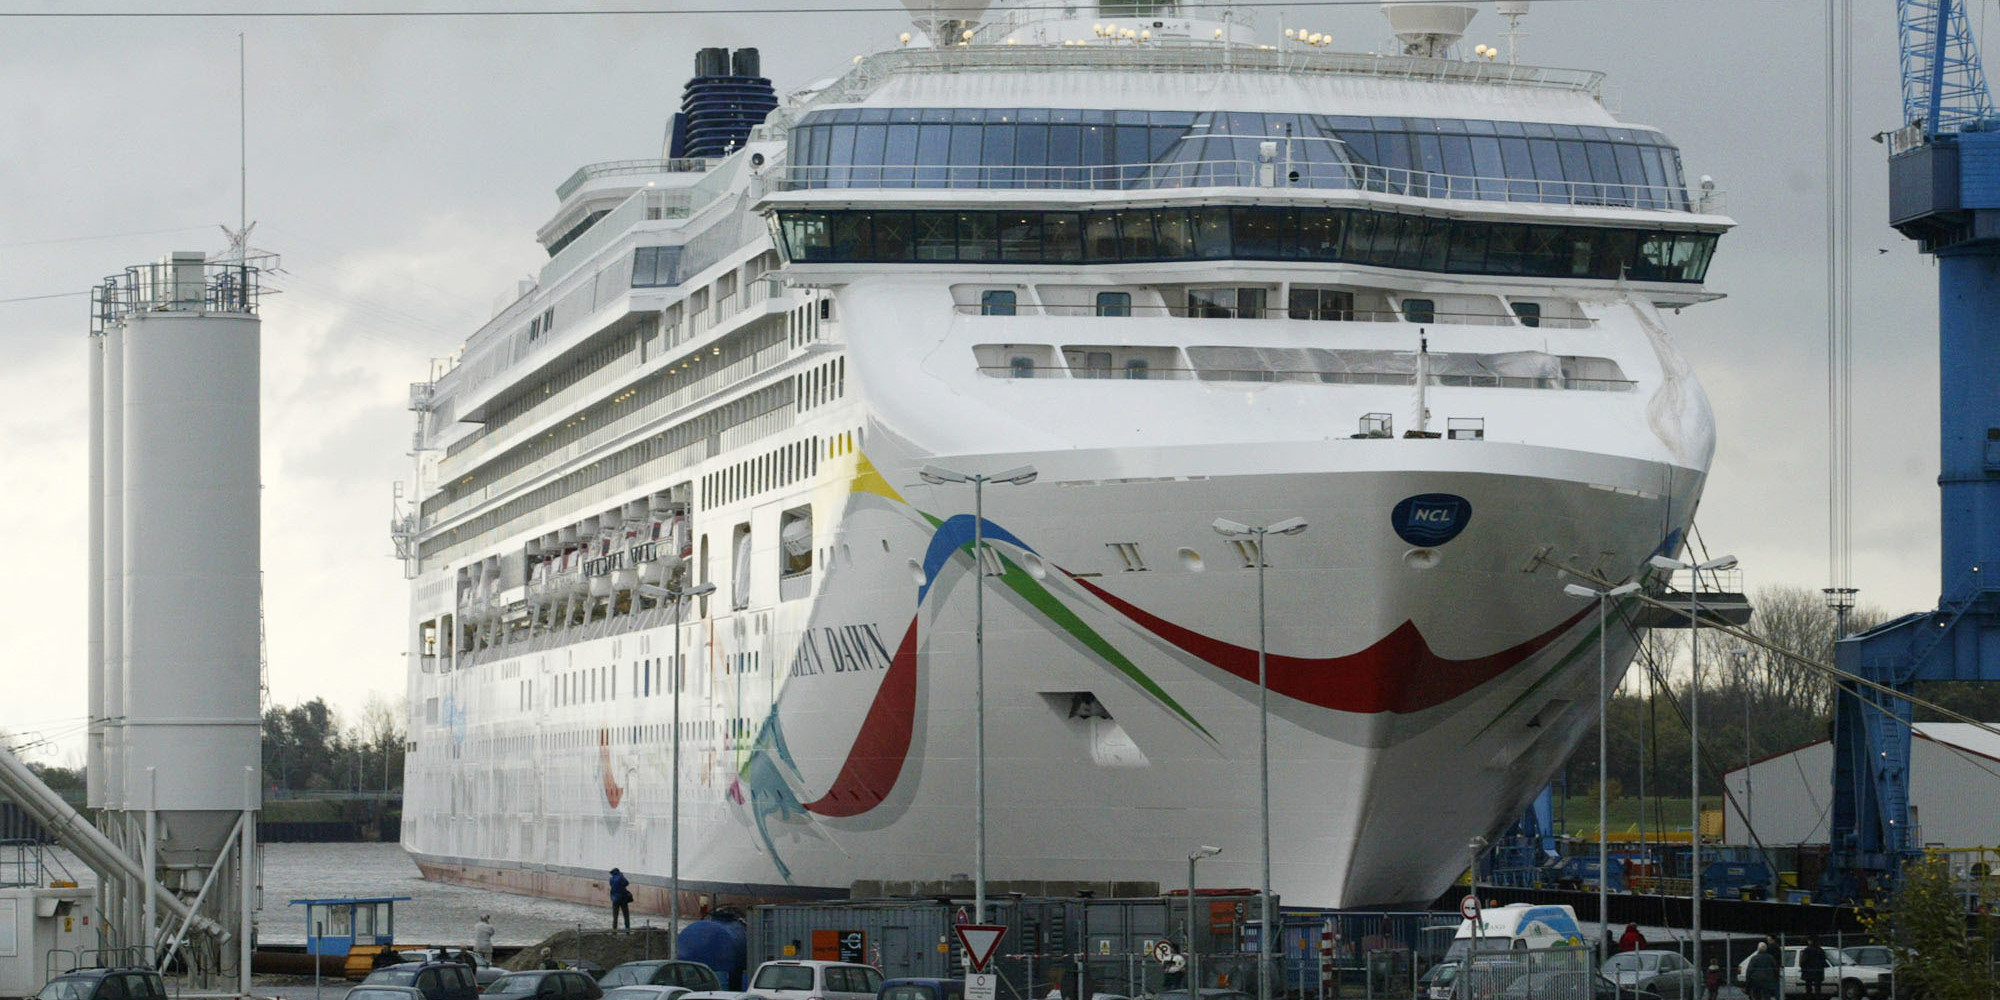 Norwegian Dawn Cruise Ship Runs Aground After Leaving Bermuda Update Huffpost